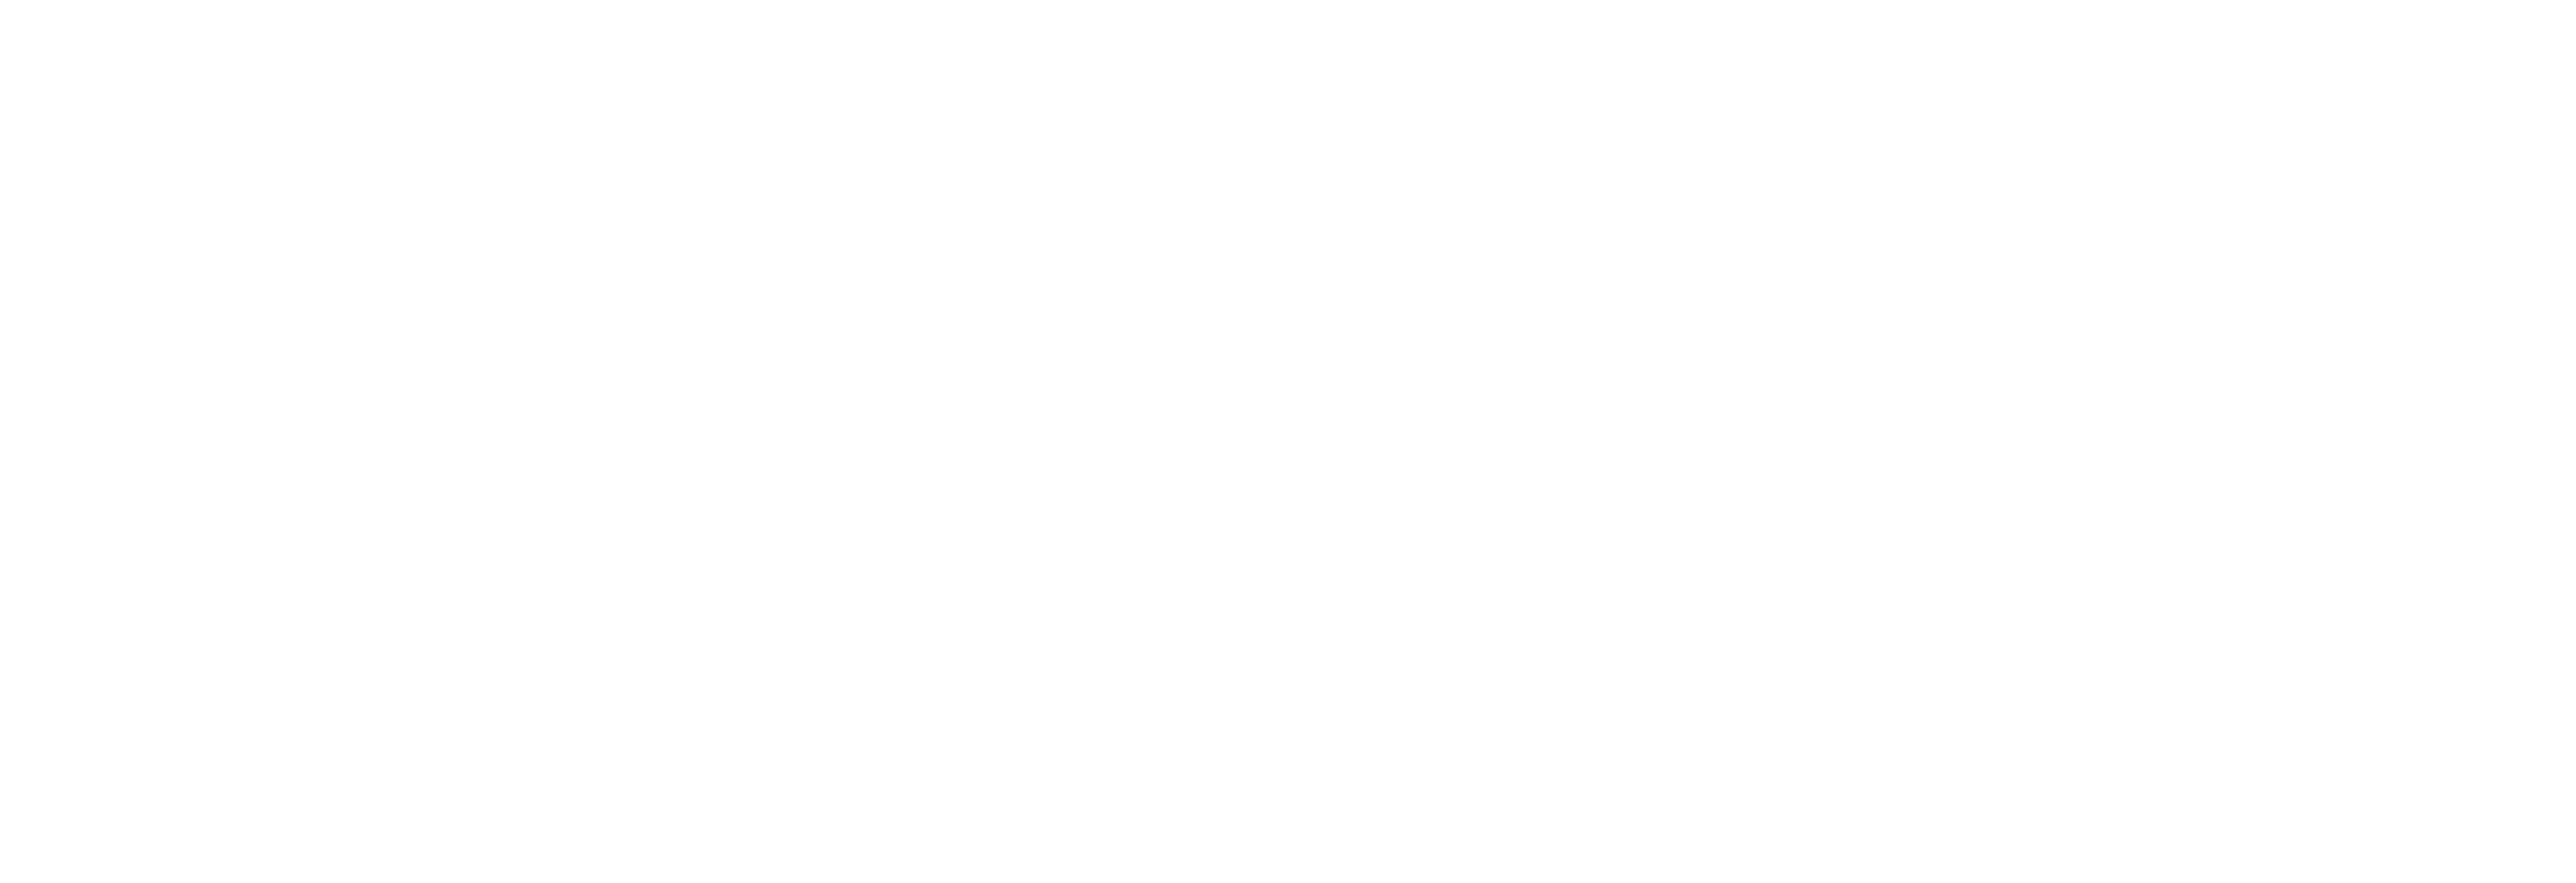 Hearth Platform